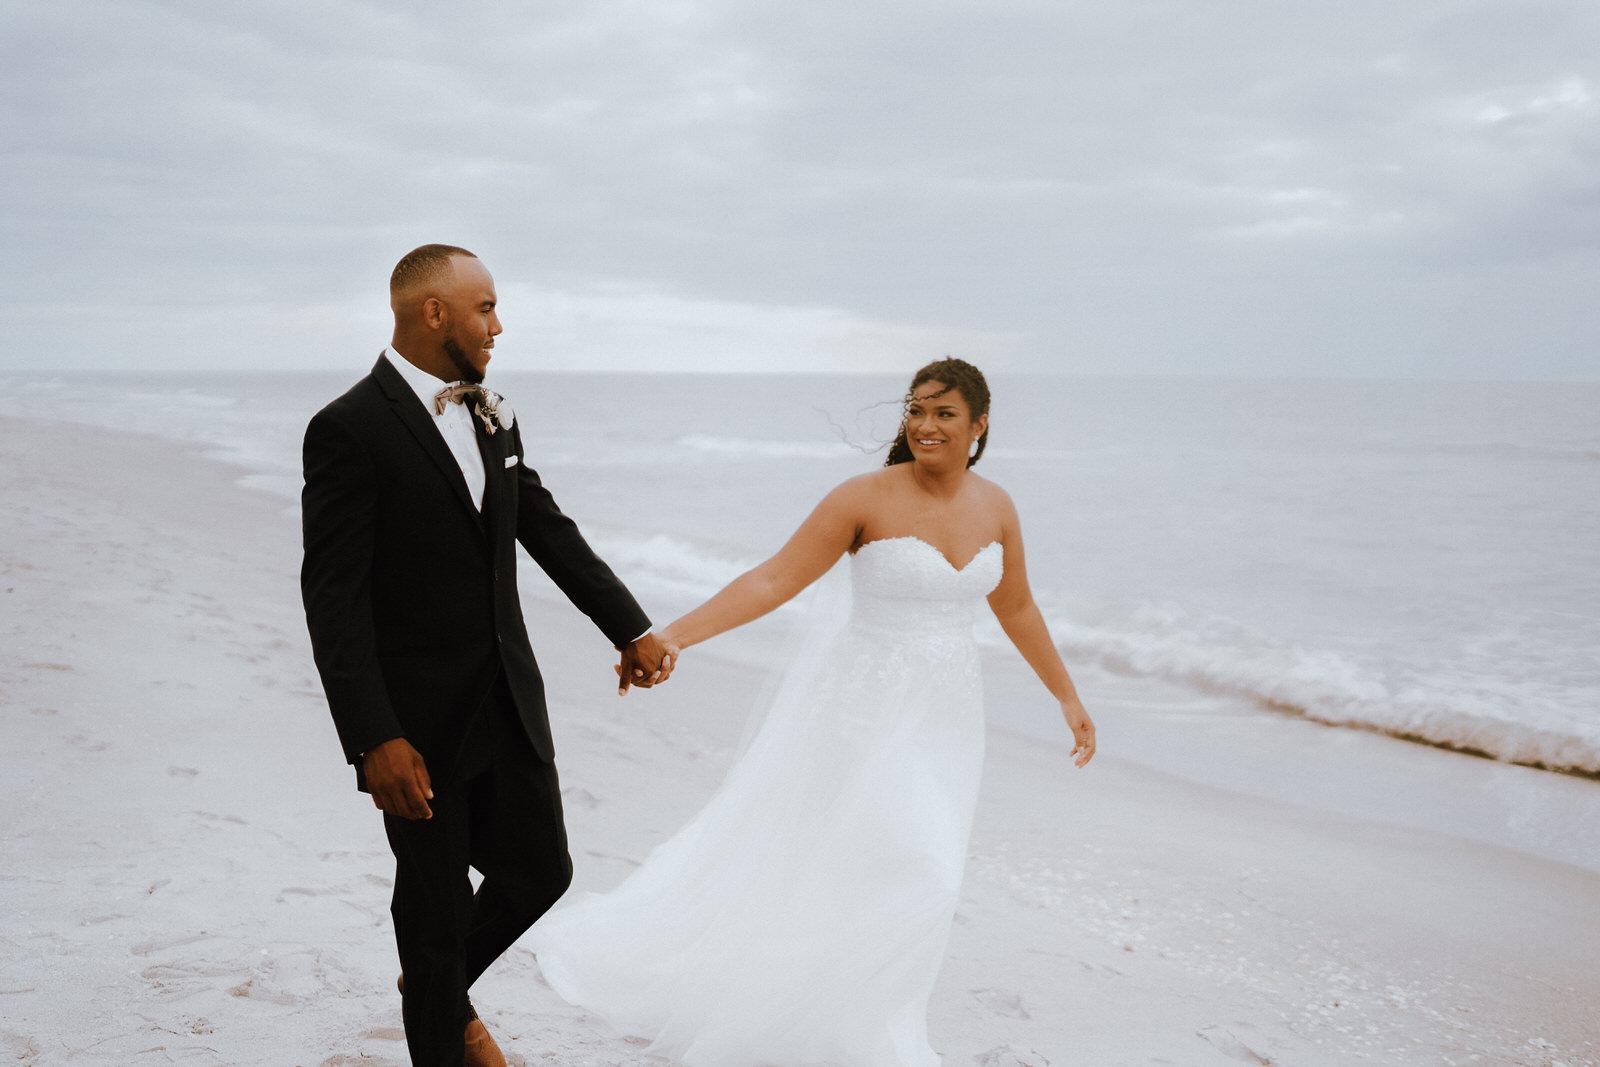 South Seas Island Resort Elopement- Alyana and Shawn- Michelle Gonzalez Photography-220.JPG